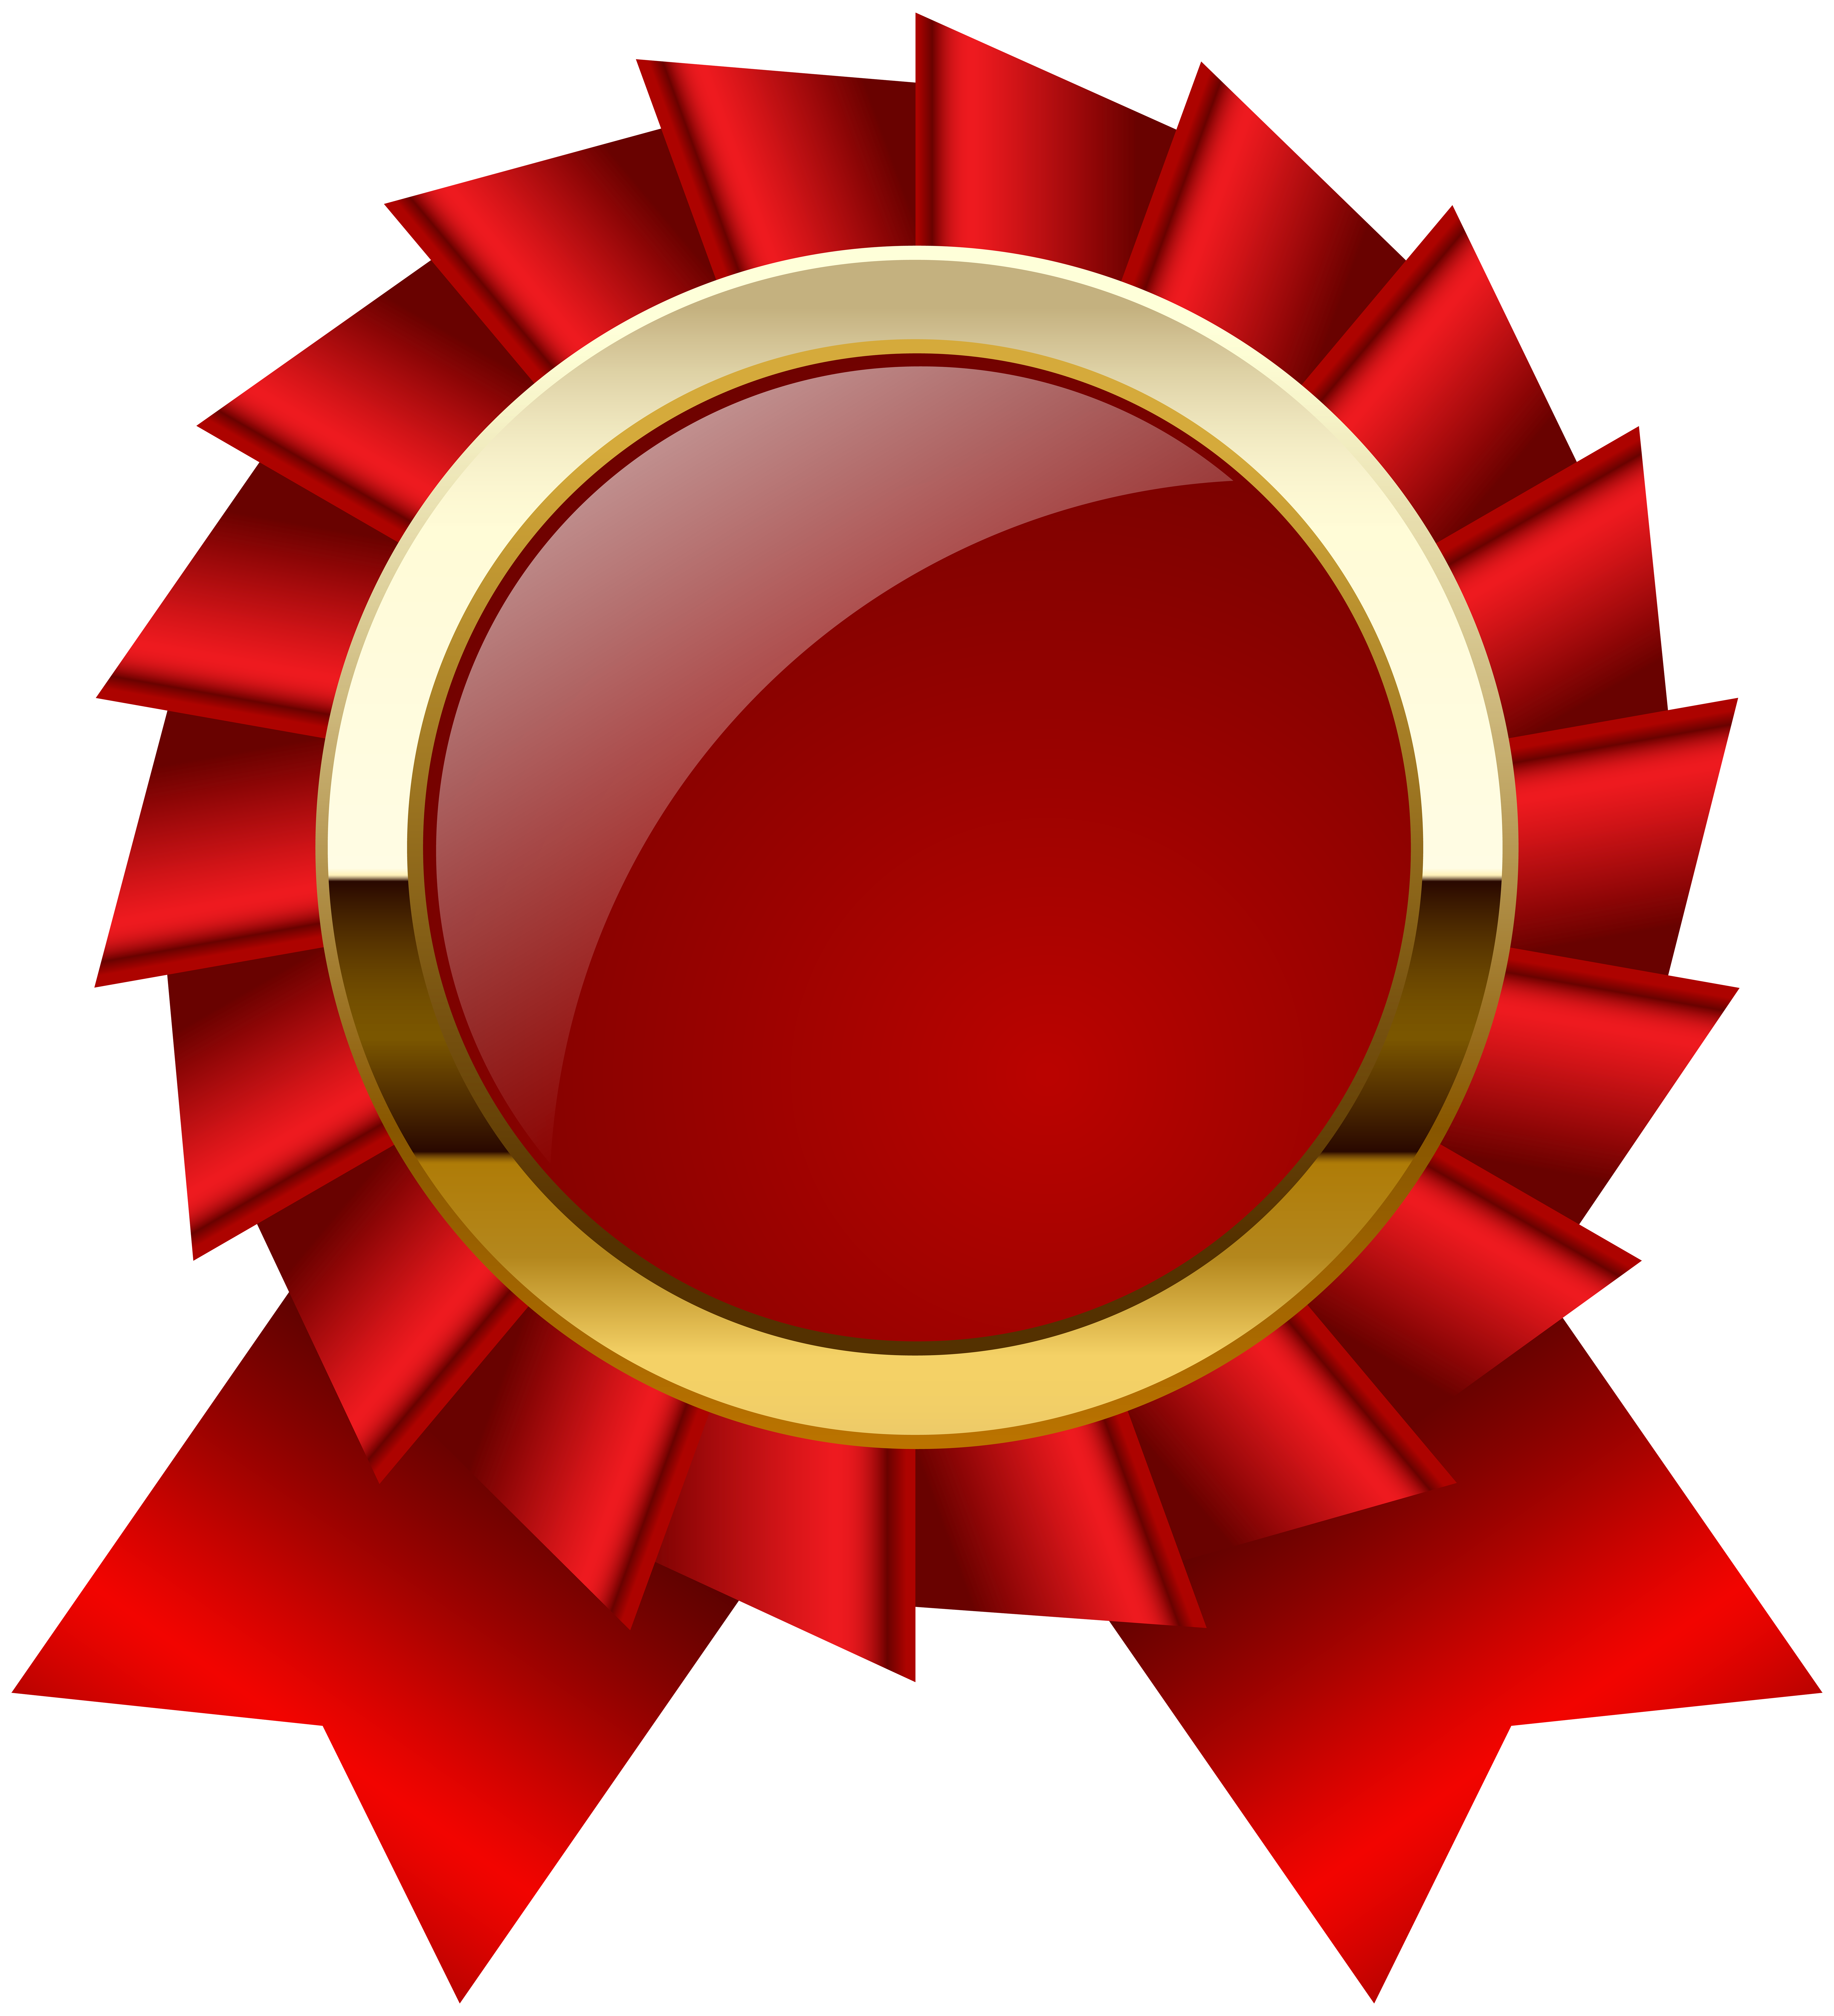 Award Ribbon Template | Free download best Award Ribbon ...